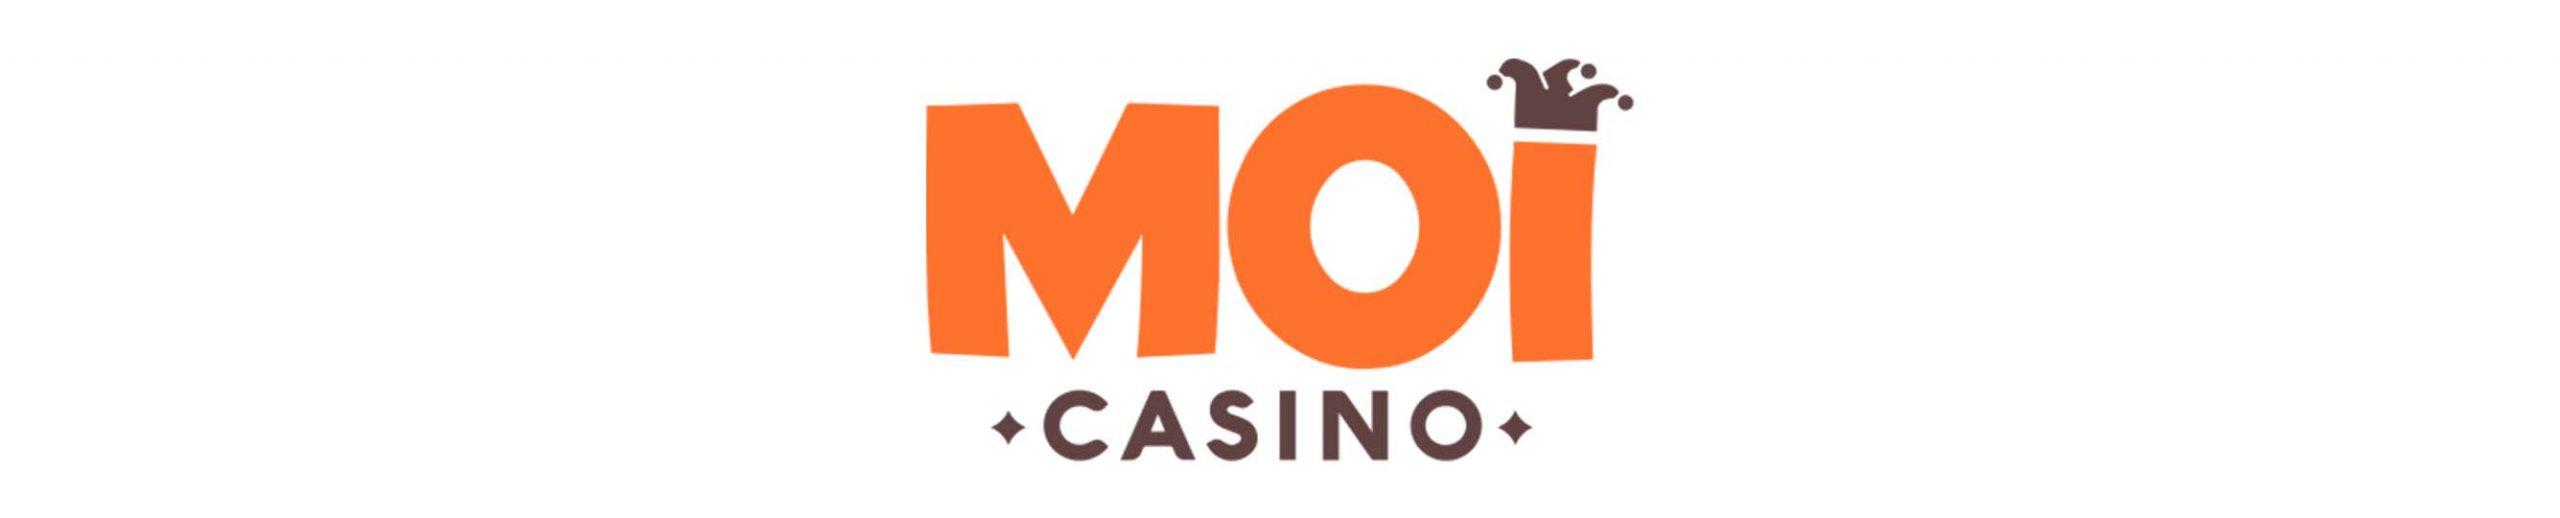 Moi Casino Test